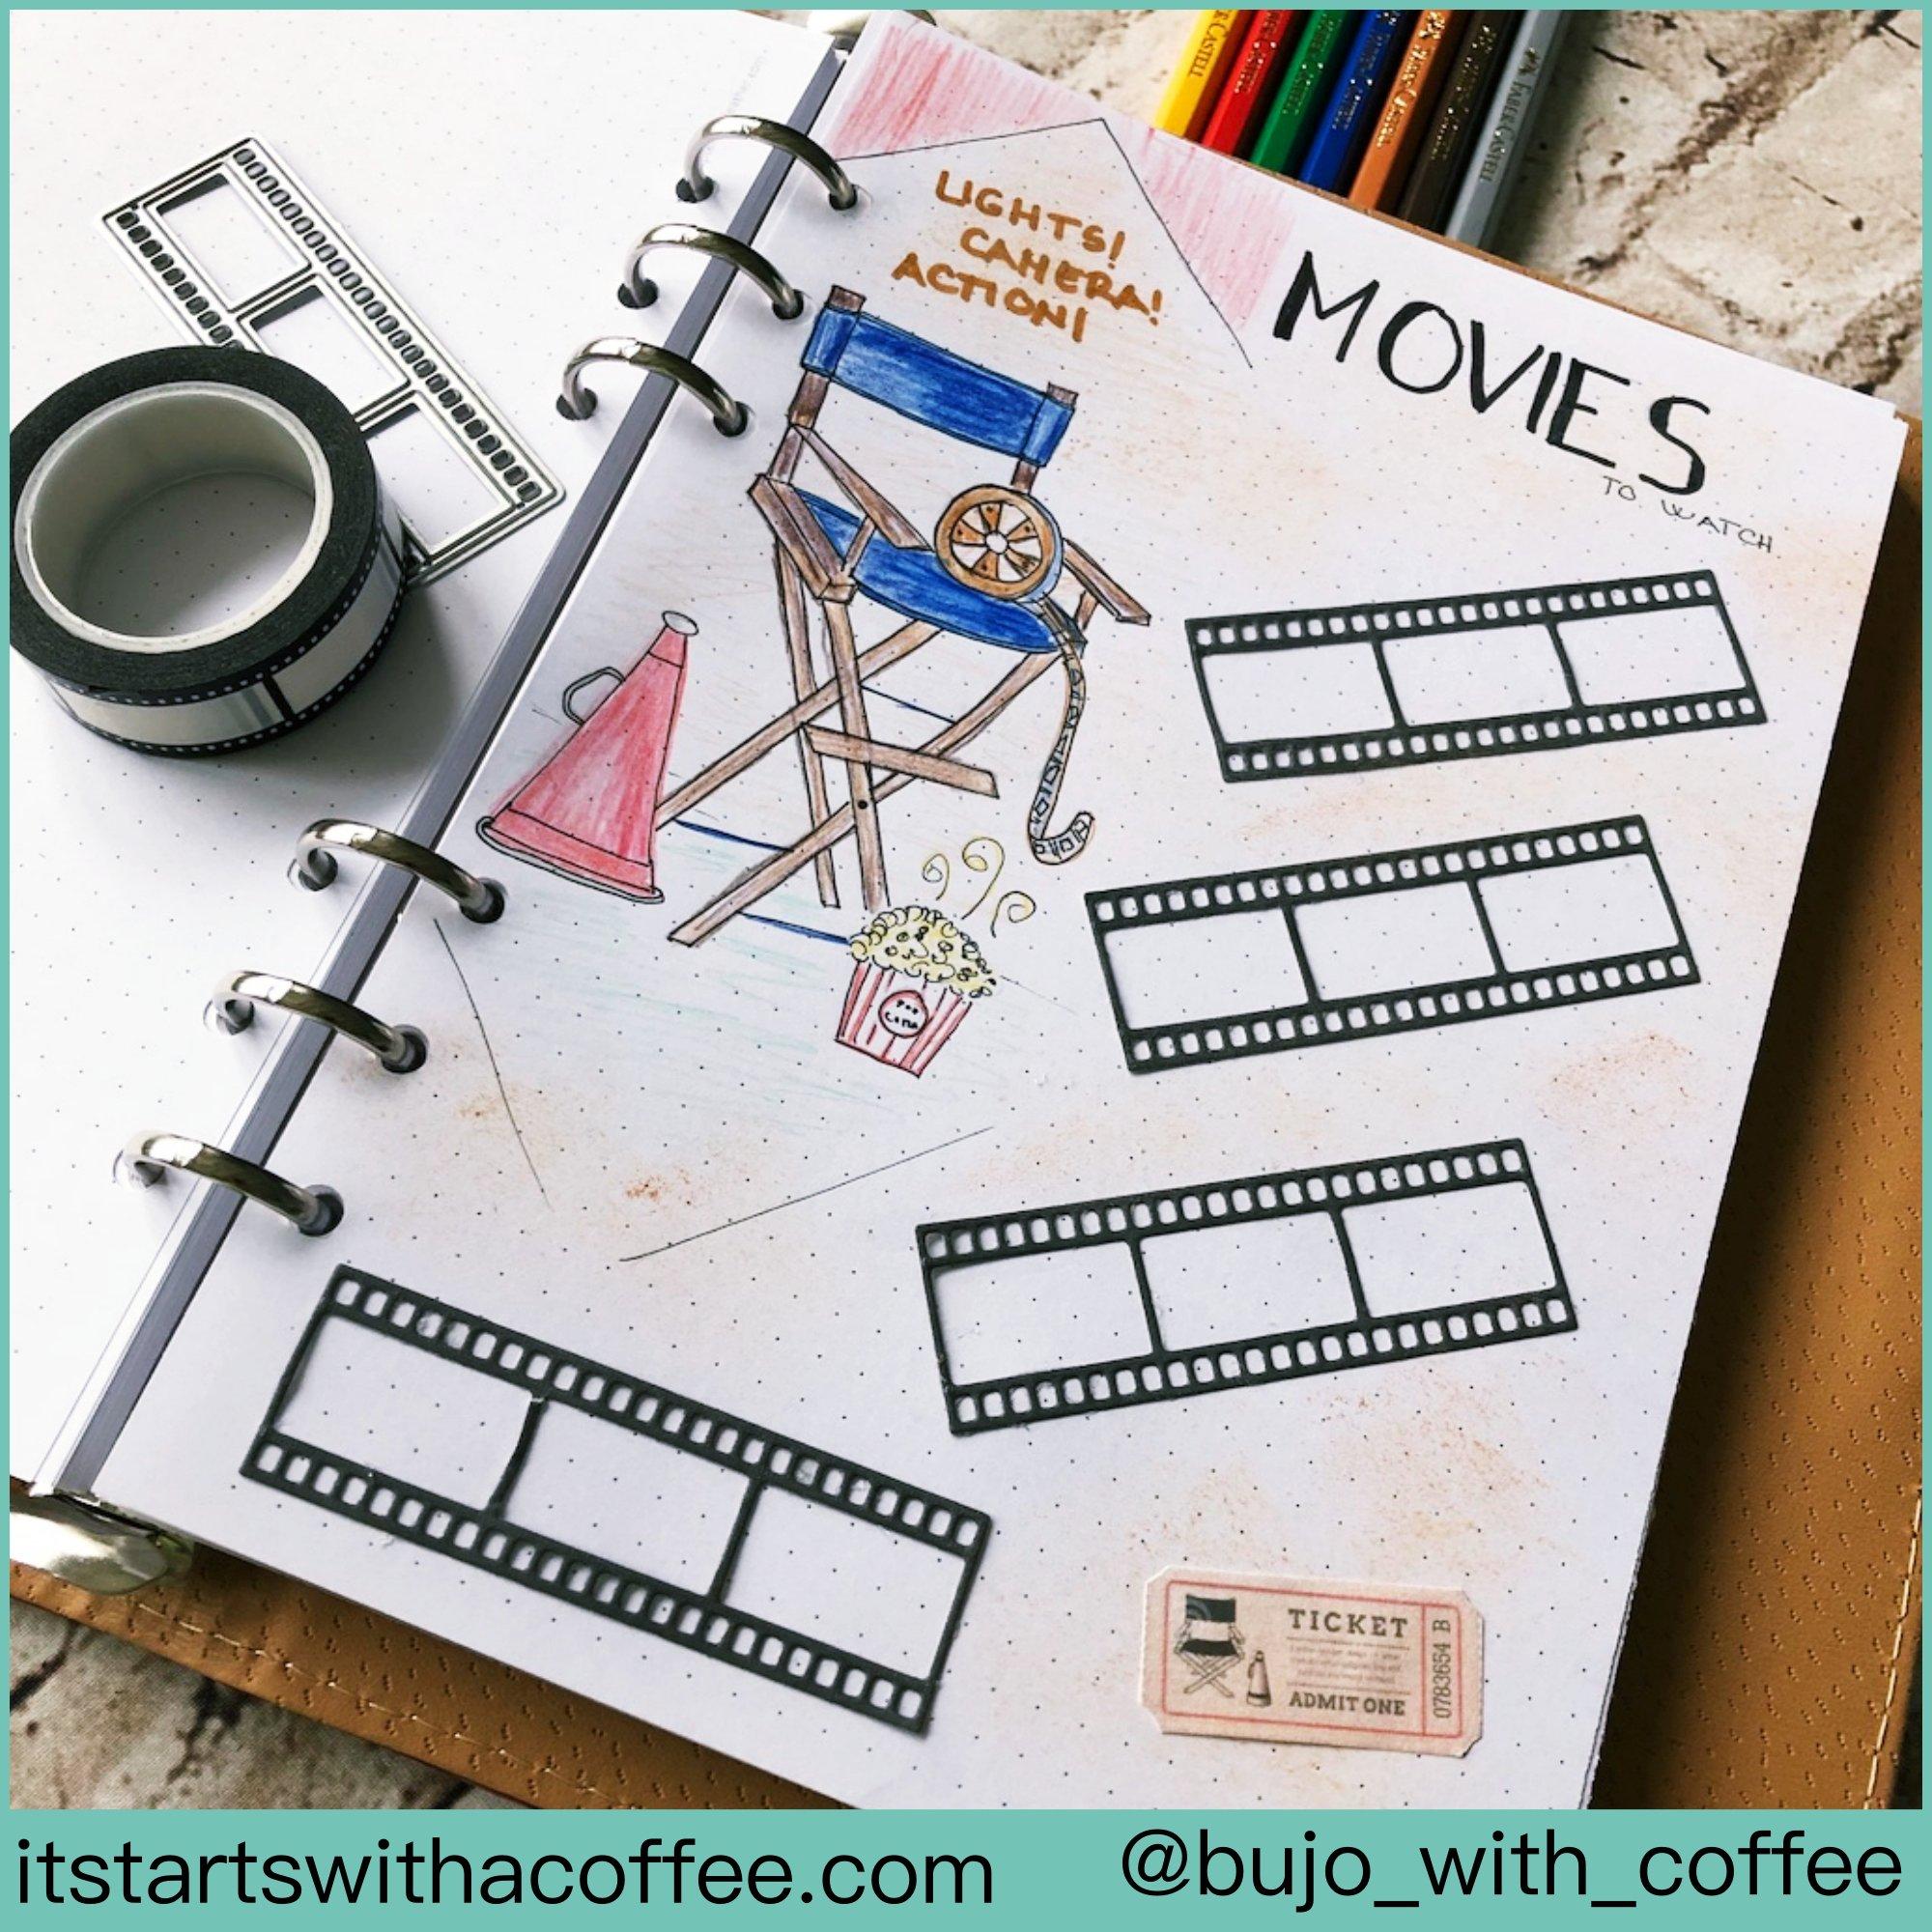 Bullet journal Movies list - itstartswithacoffee.com #bulletjournal #movies #movieslist